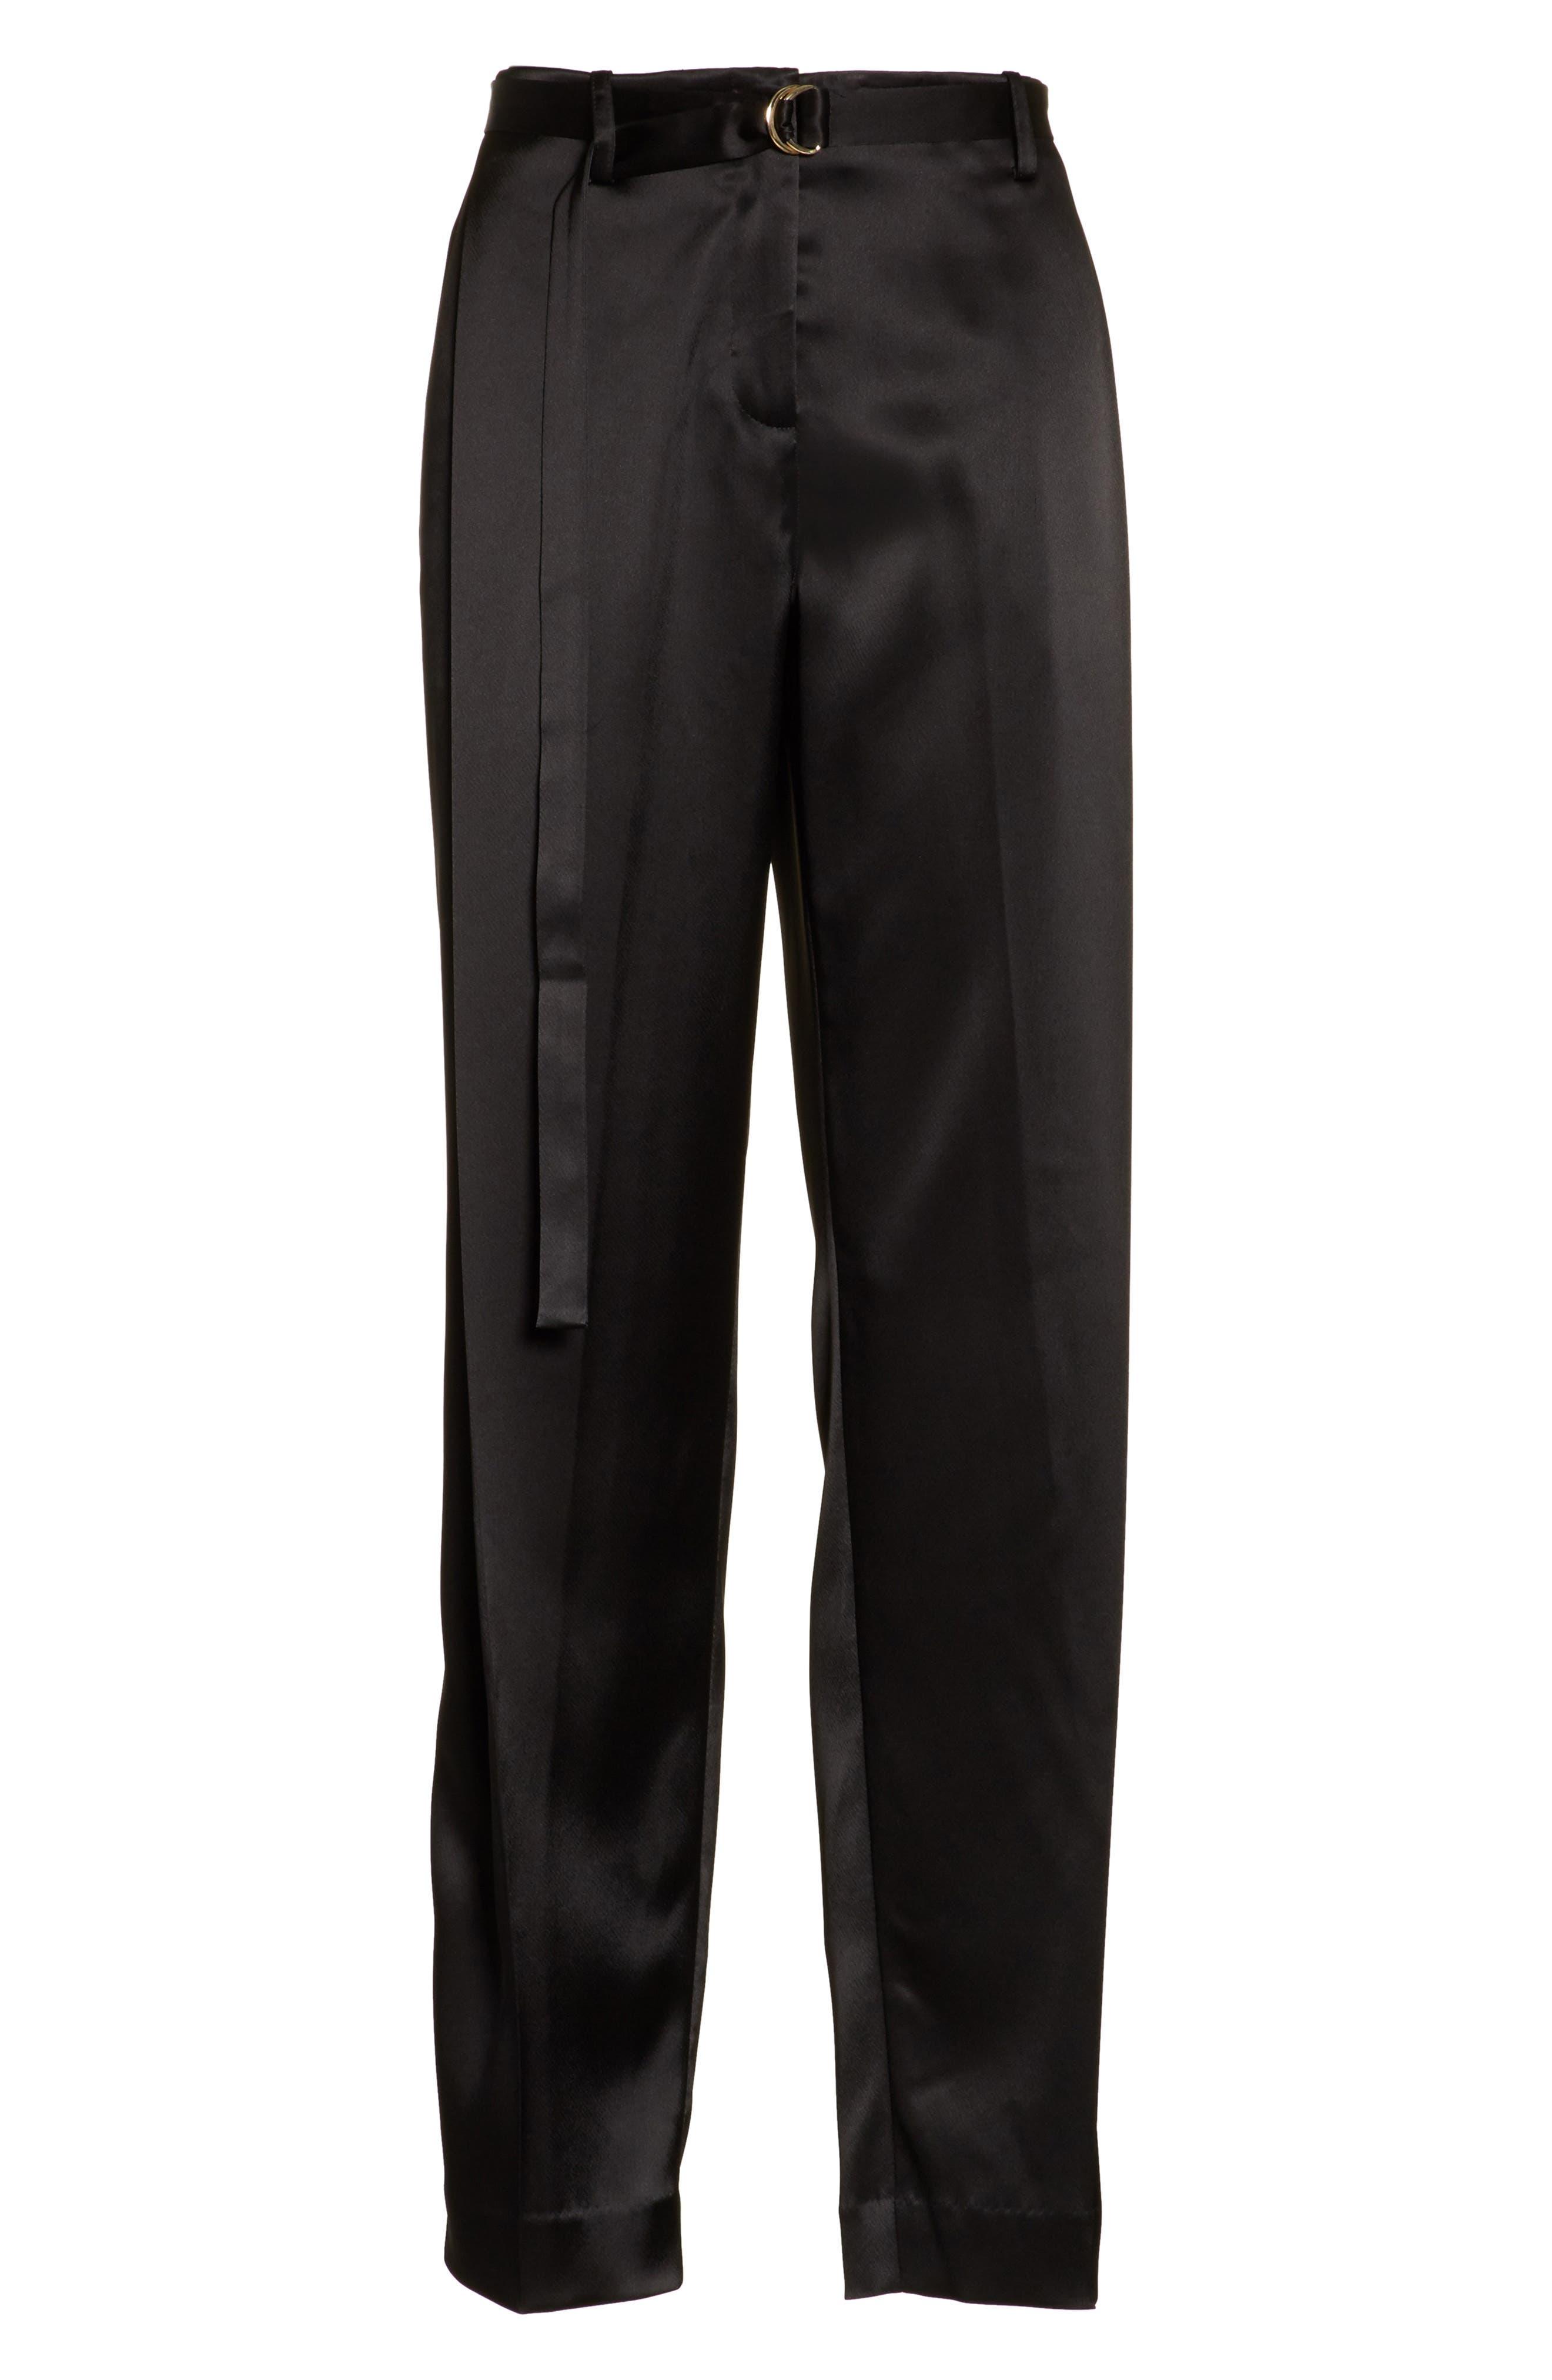 Nassau Reverie Satin Cloth Pants,                             Alternate thumbnail 6, color,                             001